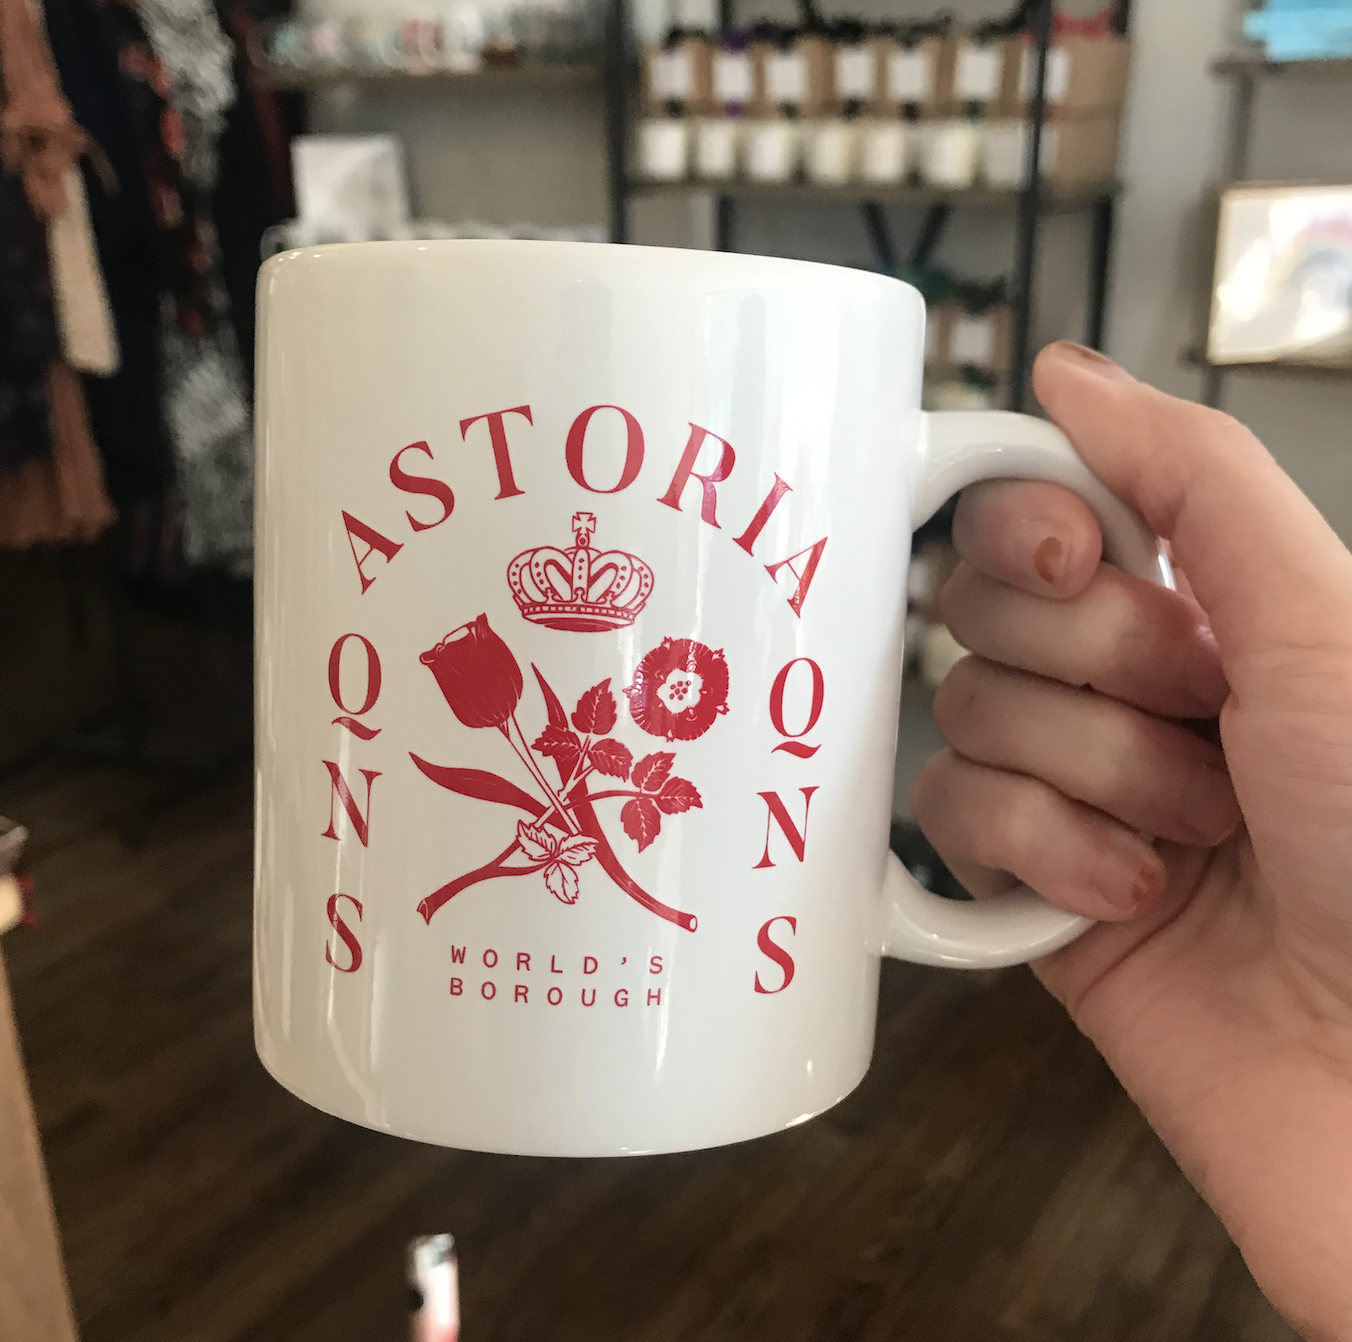 Design Brand Print World's Borough Mug